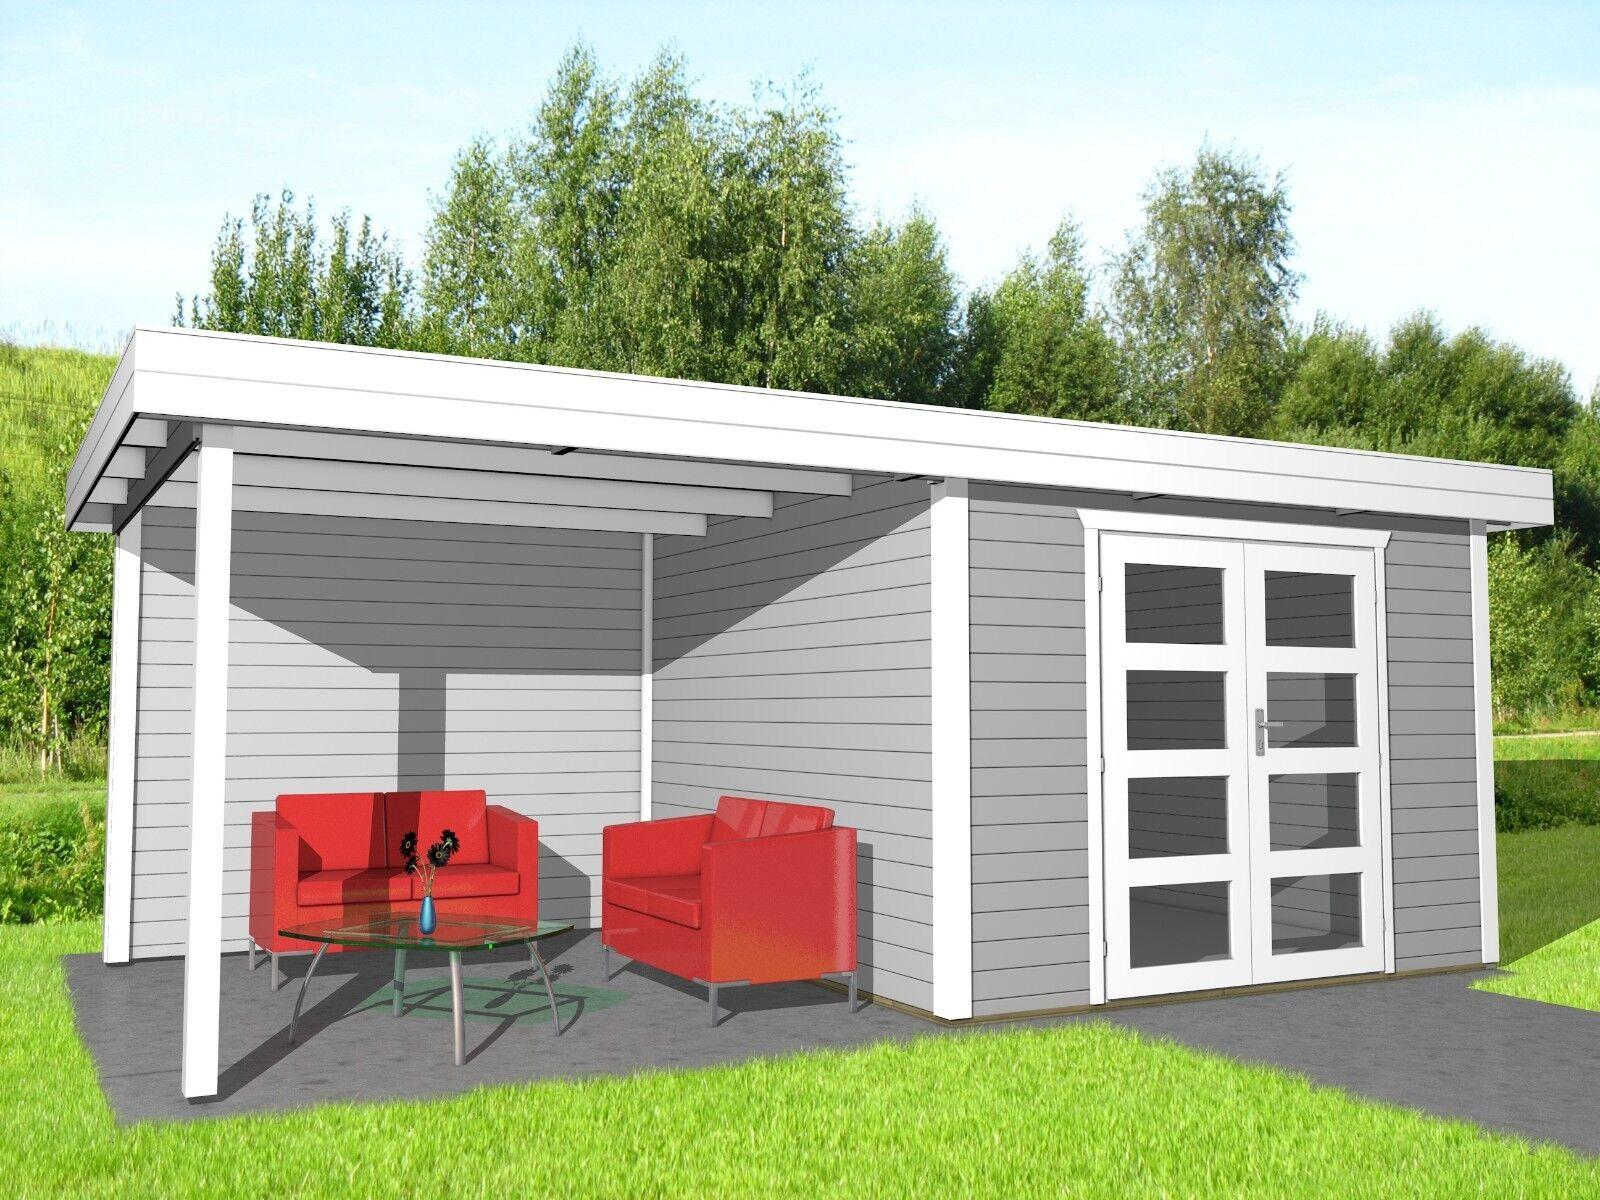 gartenhaus flachdach 28mm ger tehaus holz anbau. Black Bedroom Furniture Sets. Home Design Ideas